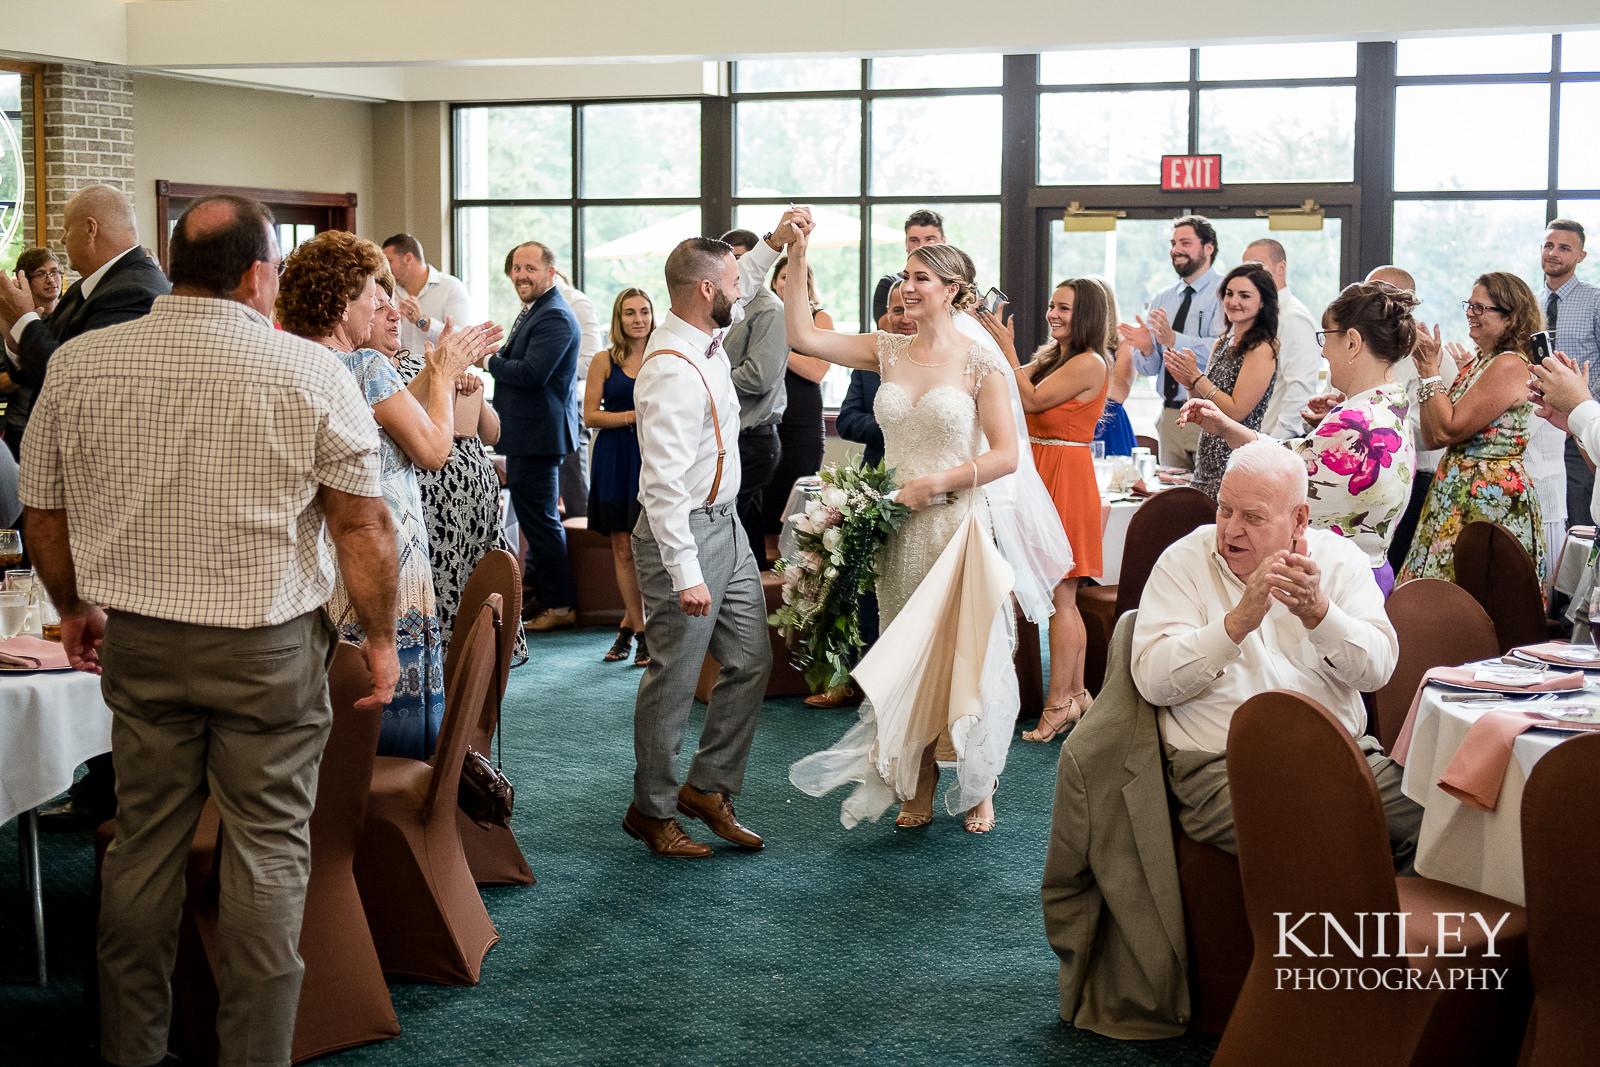 080 - Ontario Golf Club Wedding Pictures - XT2B8888.jpg